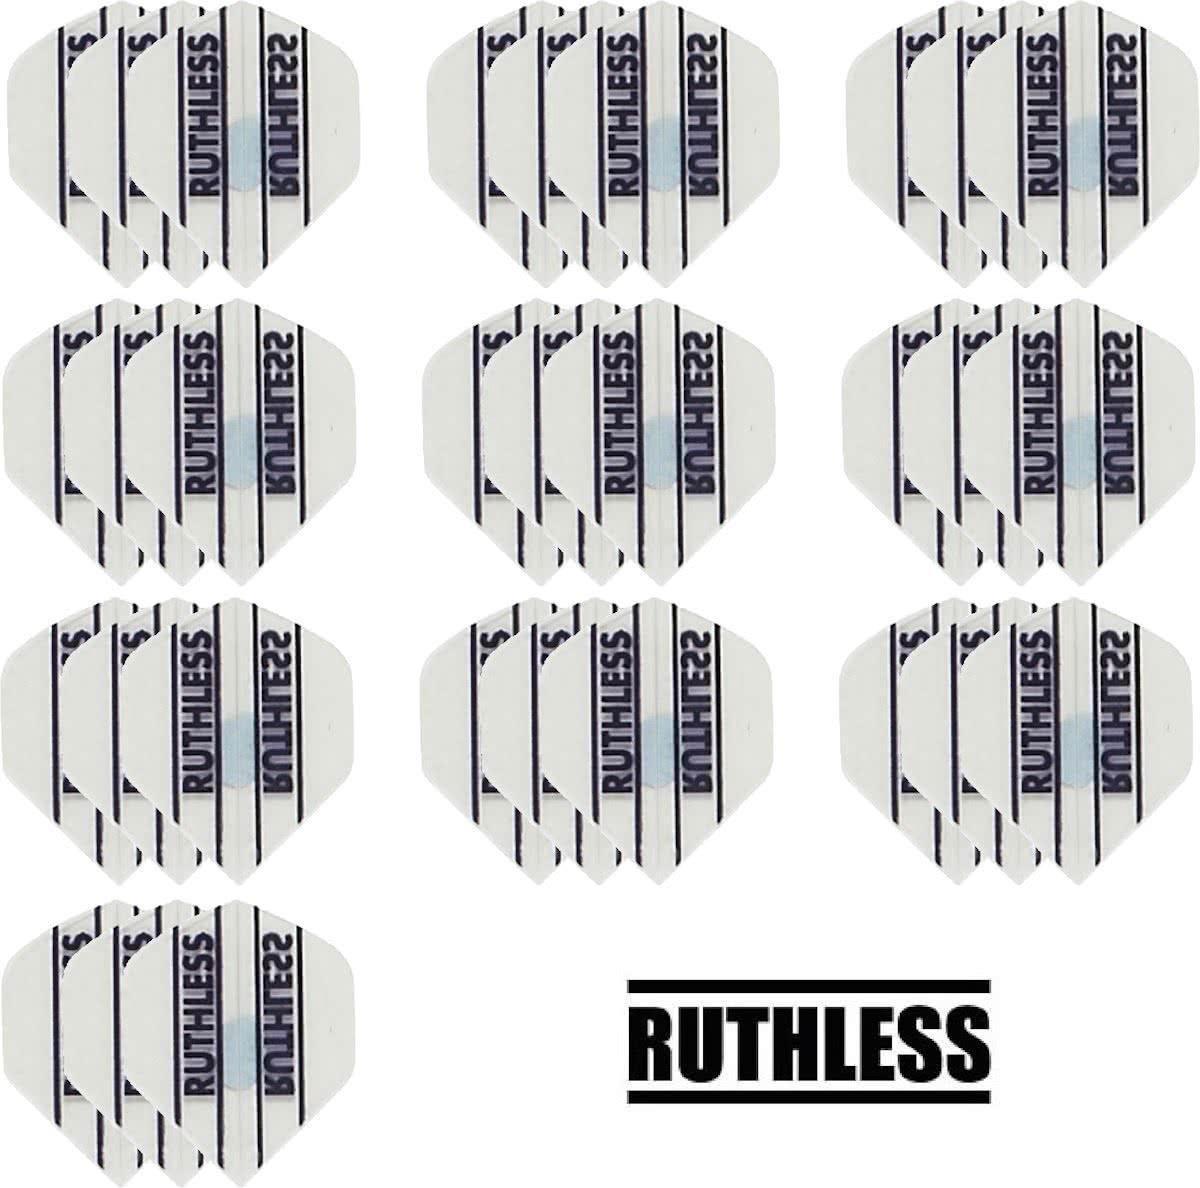 Dragon darts - 10 Sets (30 stuks) - Ruthless - sterke flights - Wit - darts flights